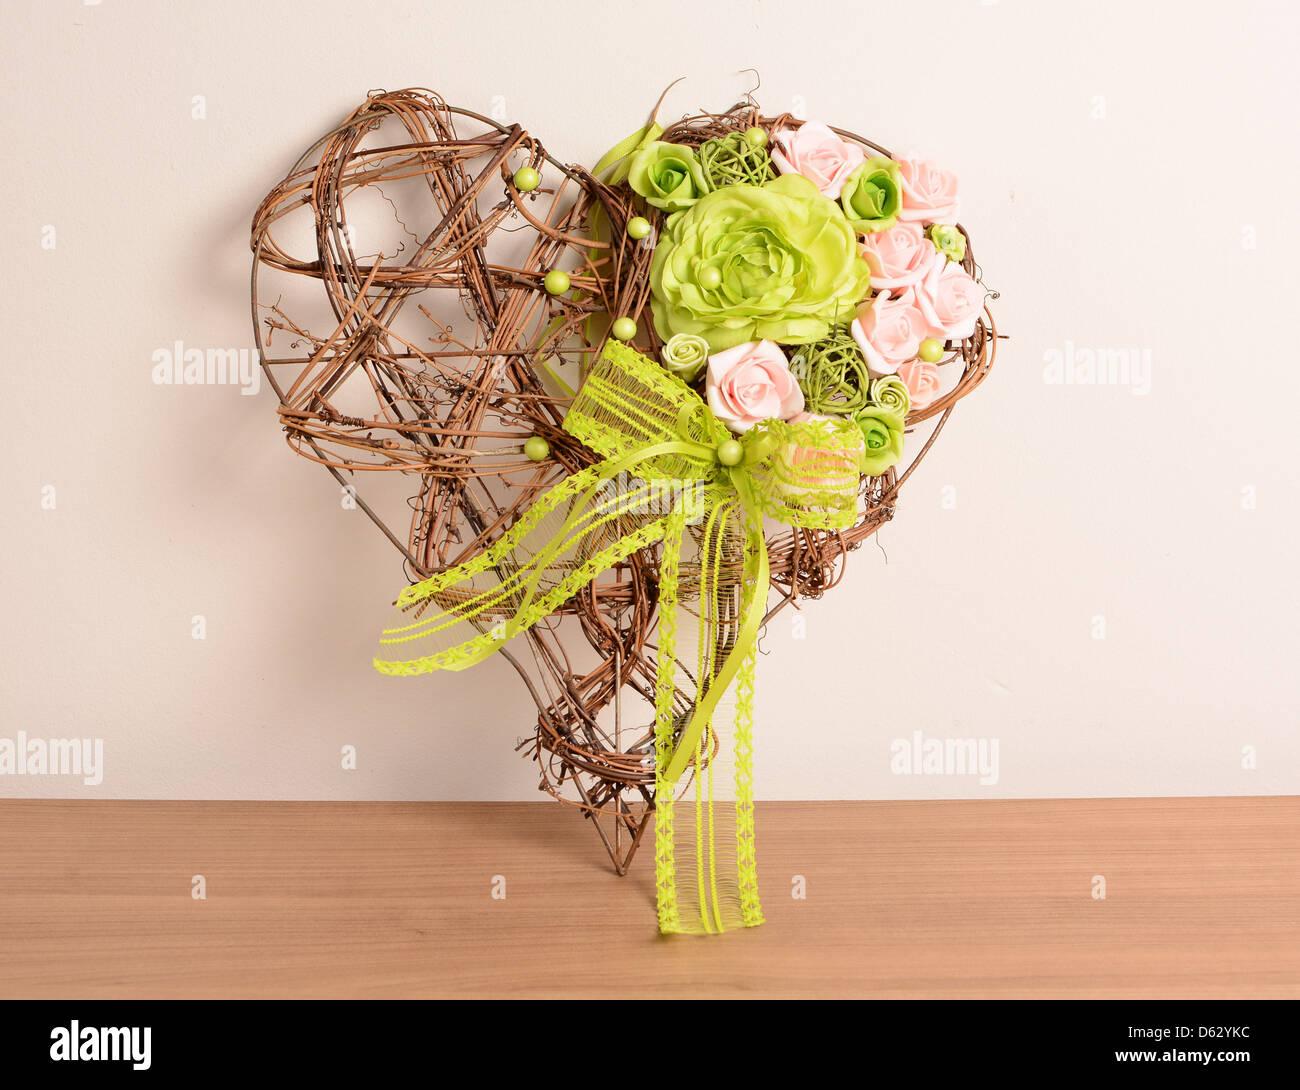 Wicker Heart Stock Photos & Wicker Heart Stock Images - Alamy